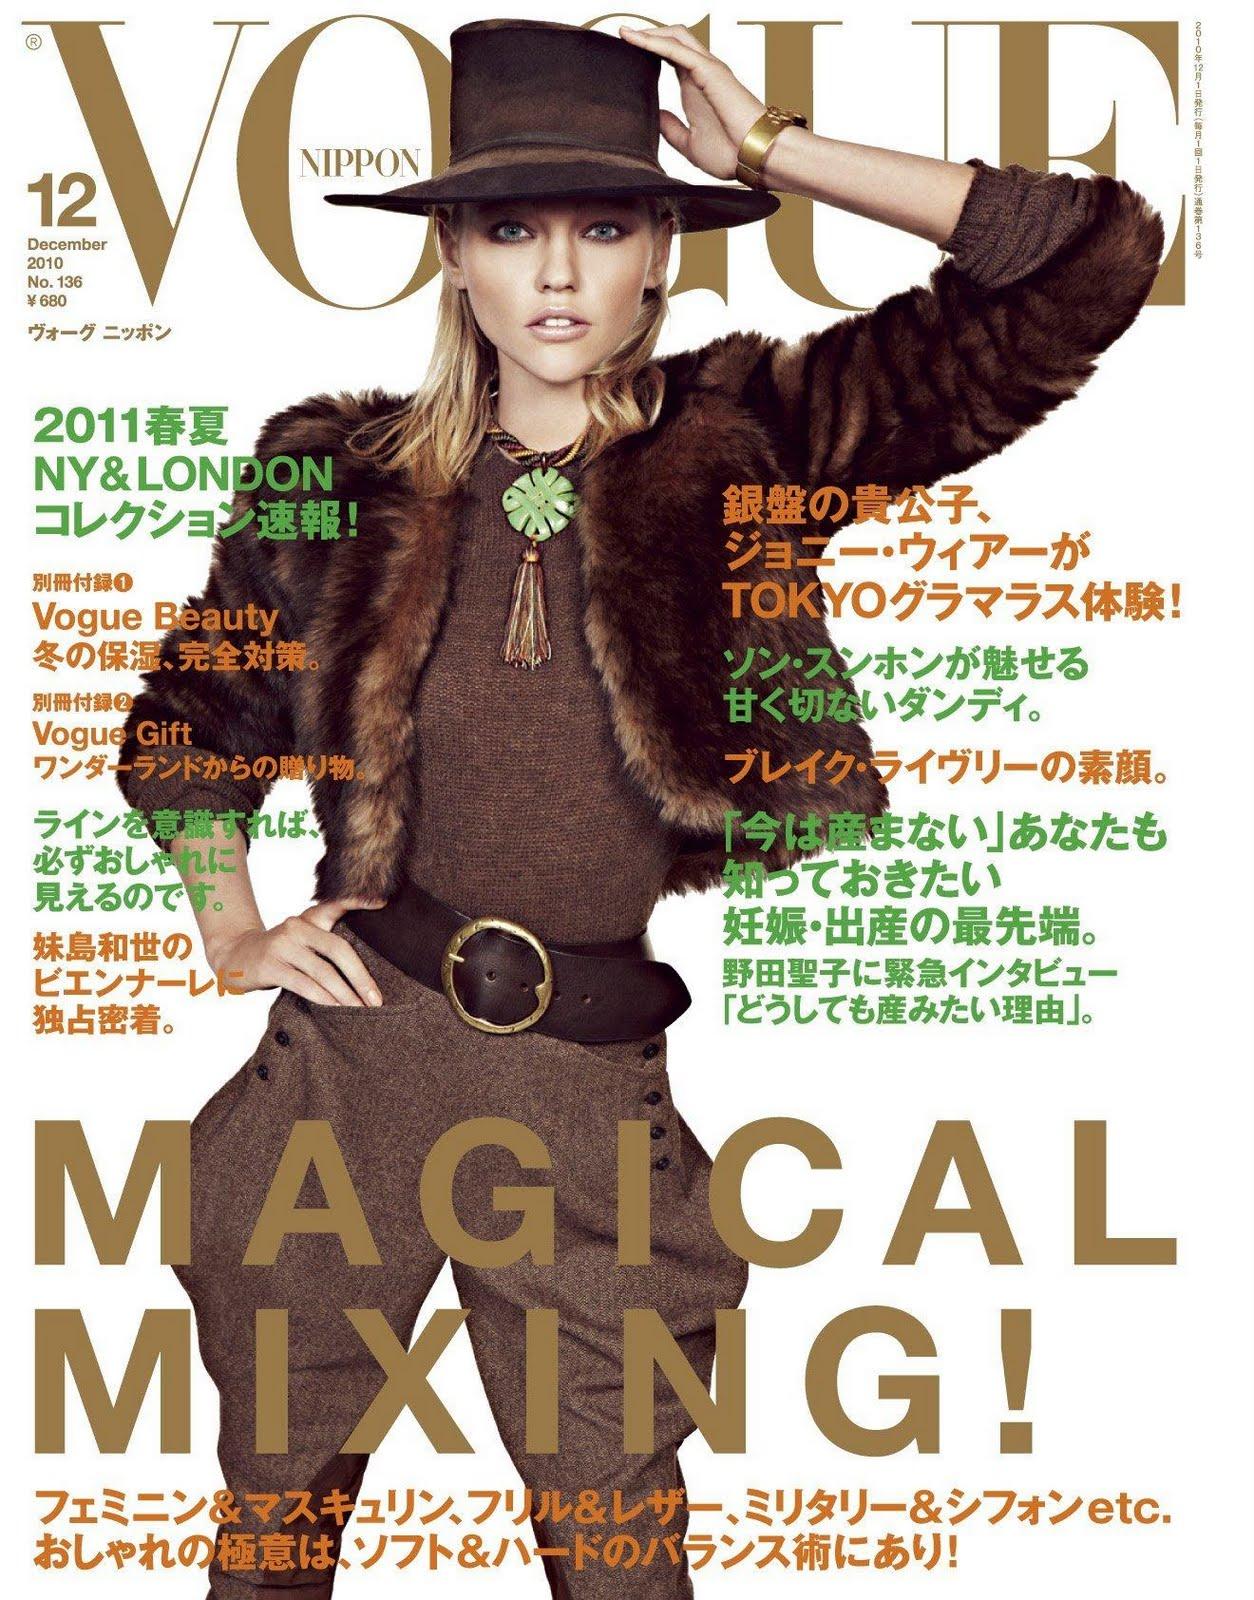 http://1.bp.blogspot.com/_mf2NYHWGS3s/TL3fWcJoHOI/AAAAAAAAL-8/VsskZBsj79o/s1600/Sasha+Pivovarova+by+Inez+%26+Vinoodh+(Vogue+Nippon+December+2010).jpg